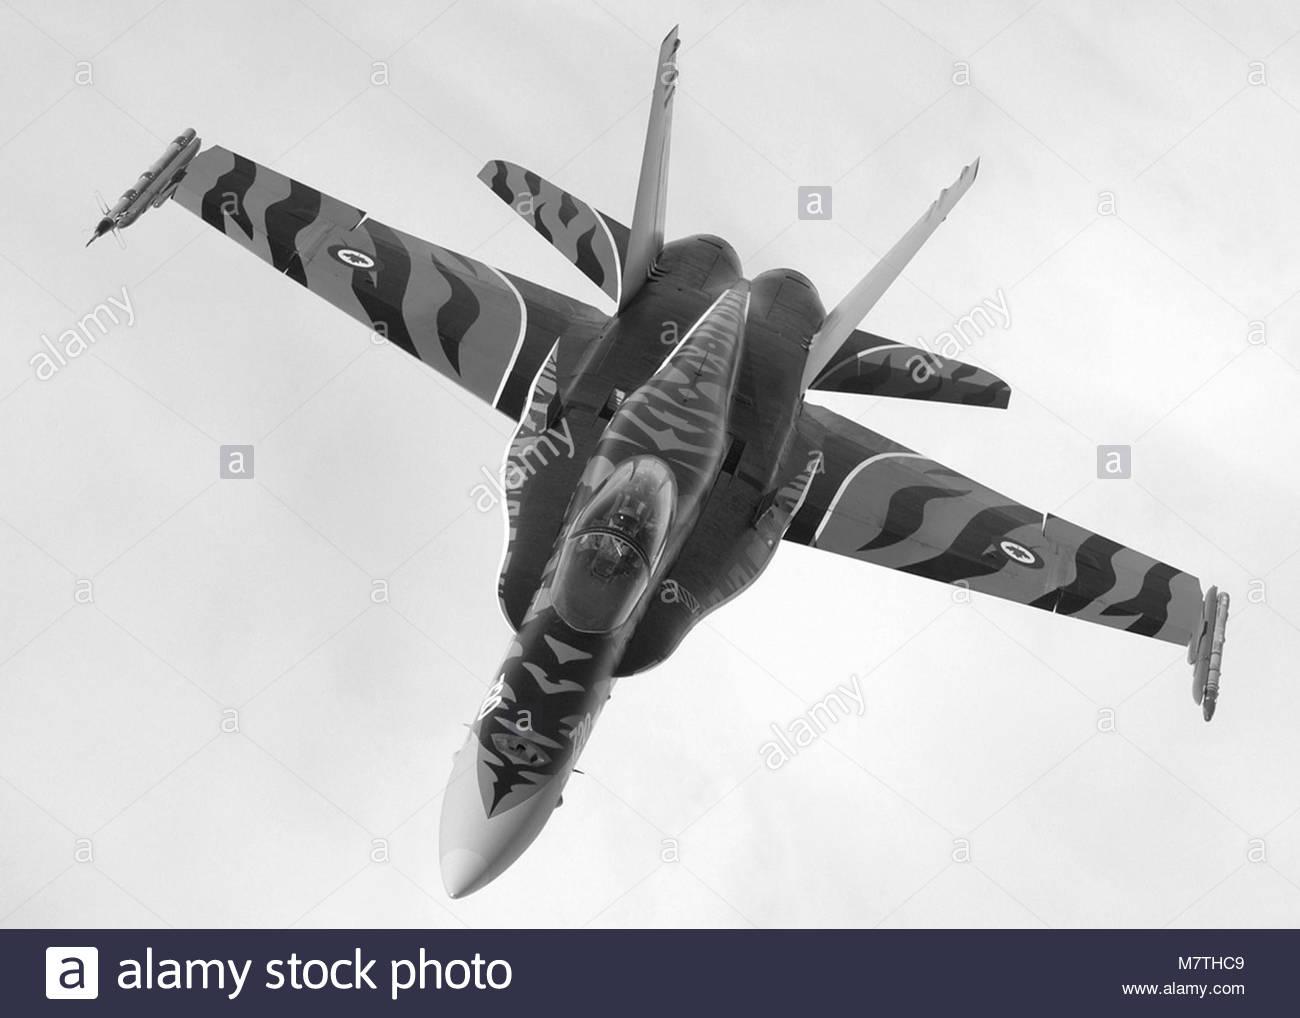 CF-18 Tiger Bird. September / septembre  2004   CFB / BFC Cold Lake, Alberta  Demonstration Team Pilot Captain Travis - Stock Image